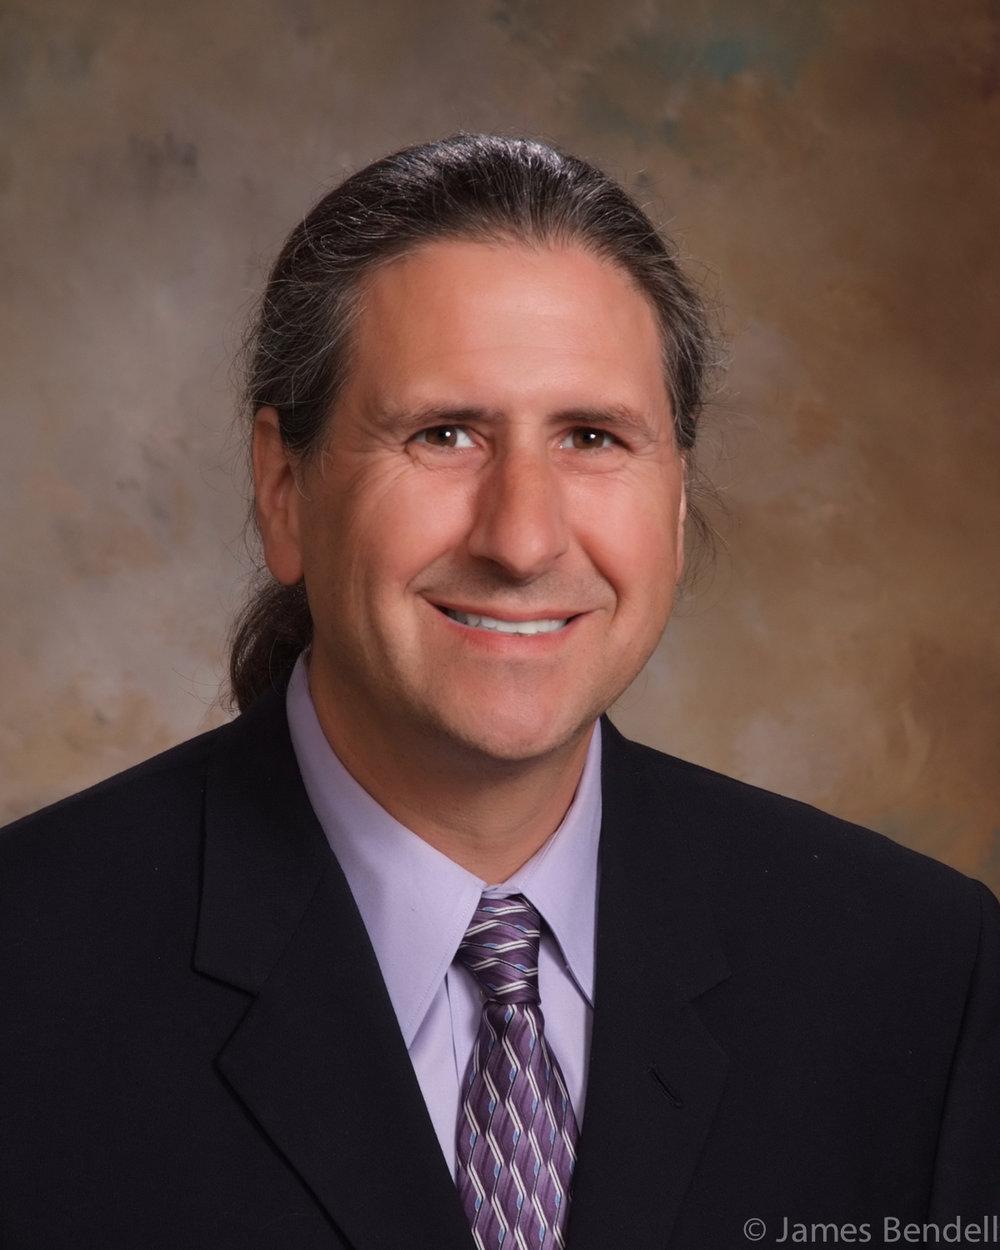 James Bendell, MD Lanier pic 02 2011 copy.jpg